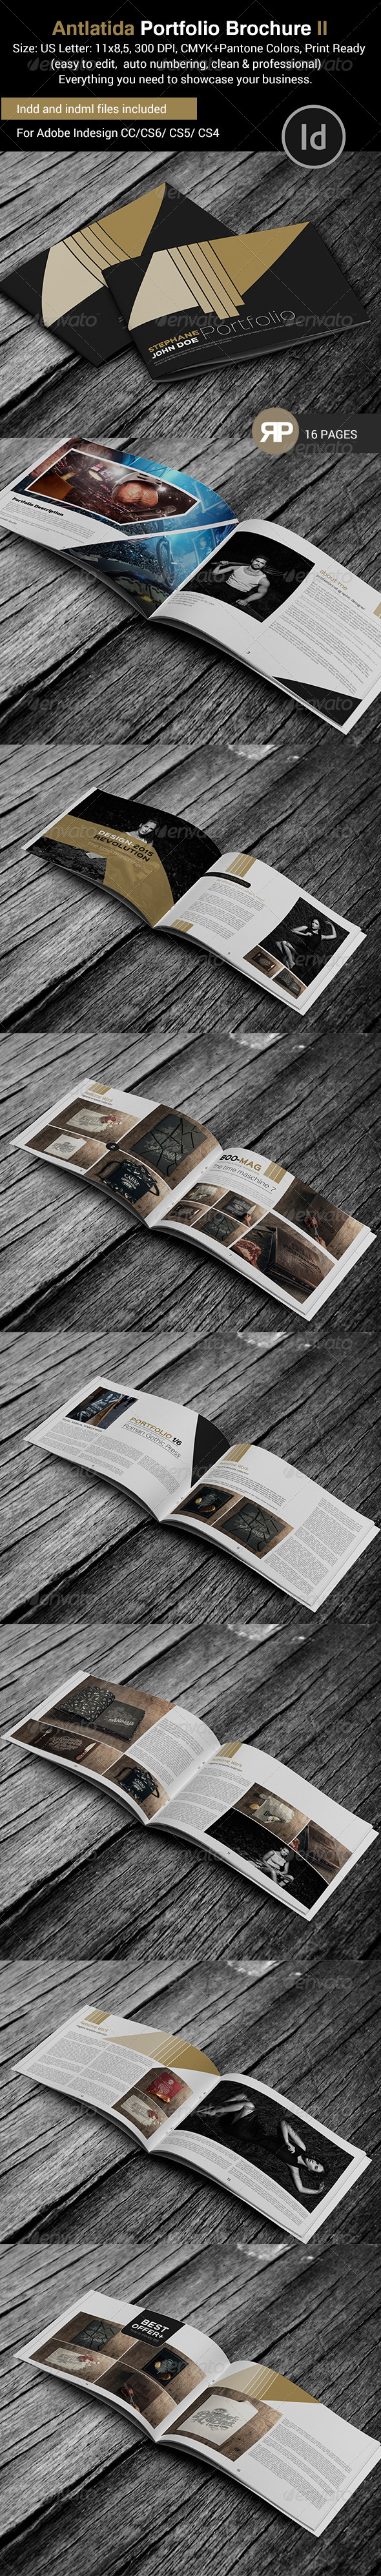 GraphicRiver Antlantida Portfolio Brochure Template 7865969